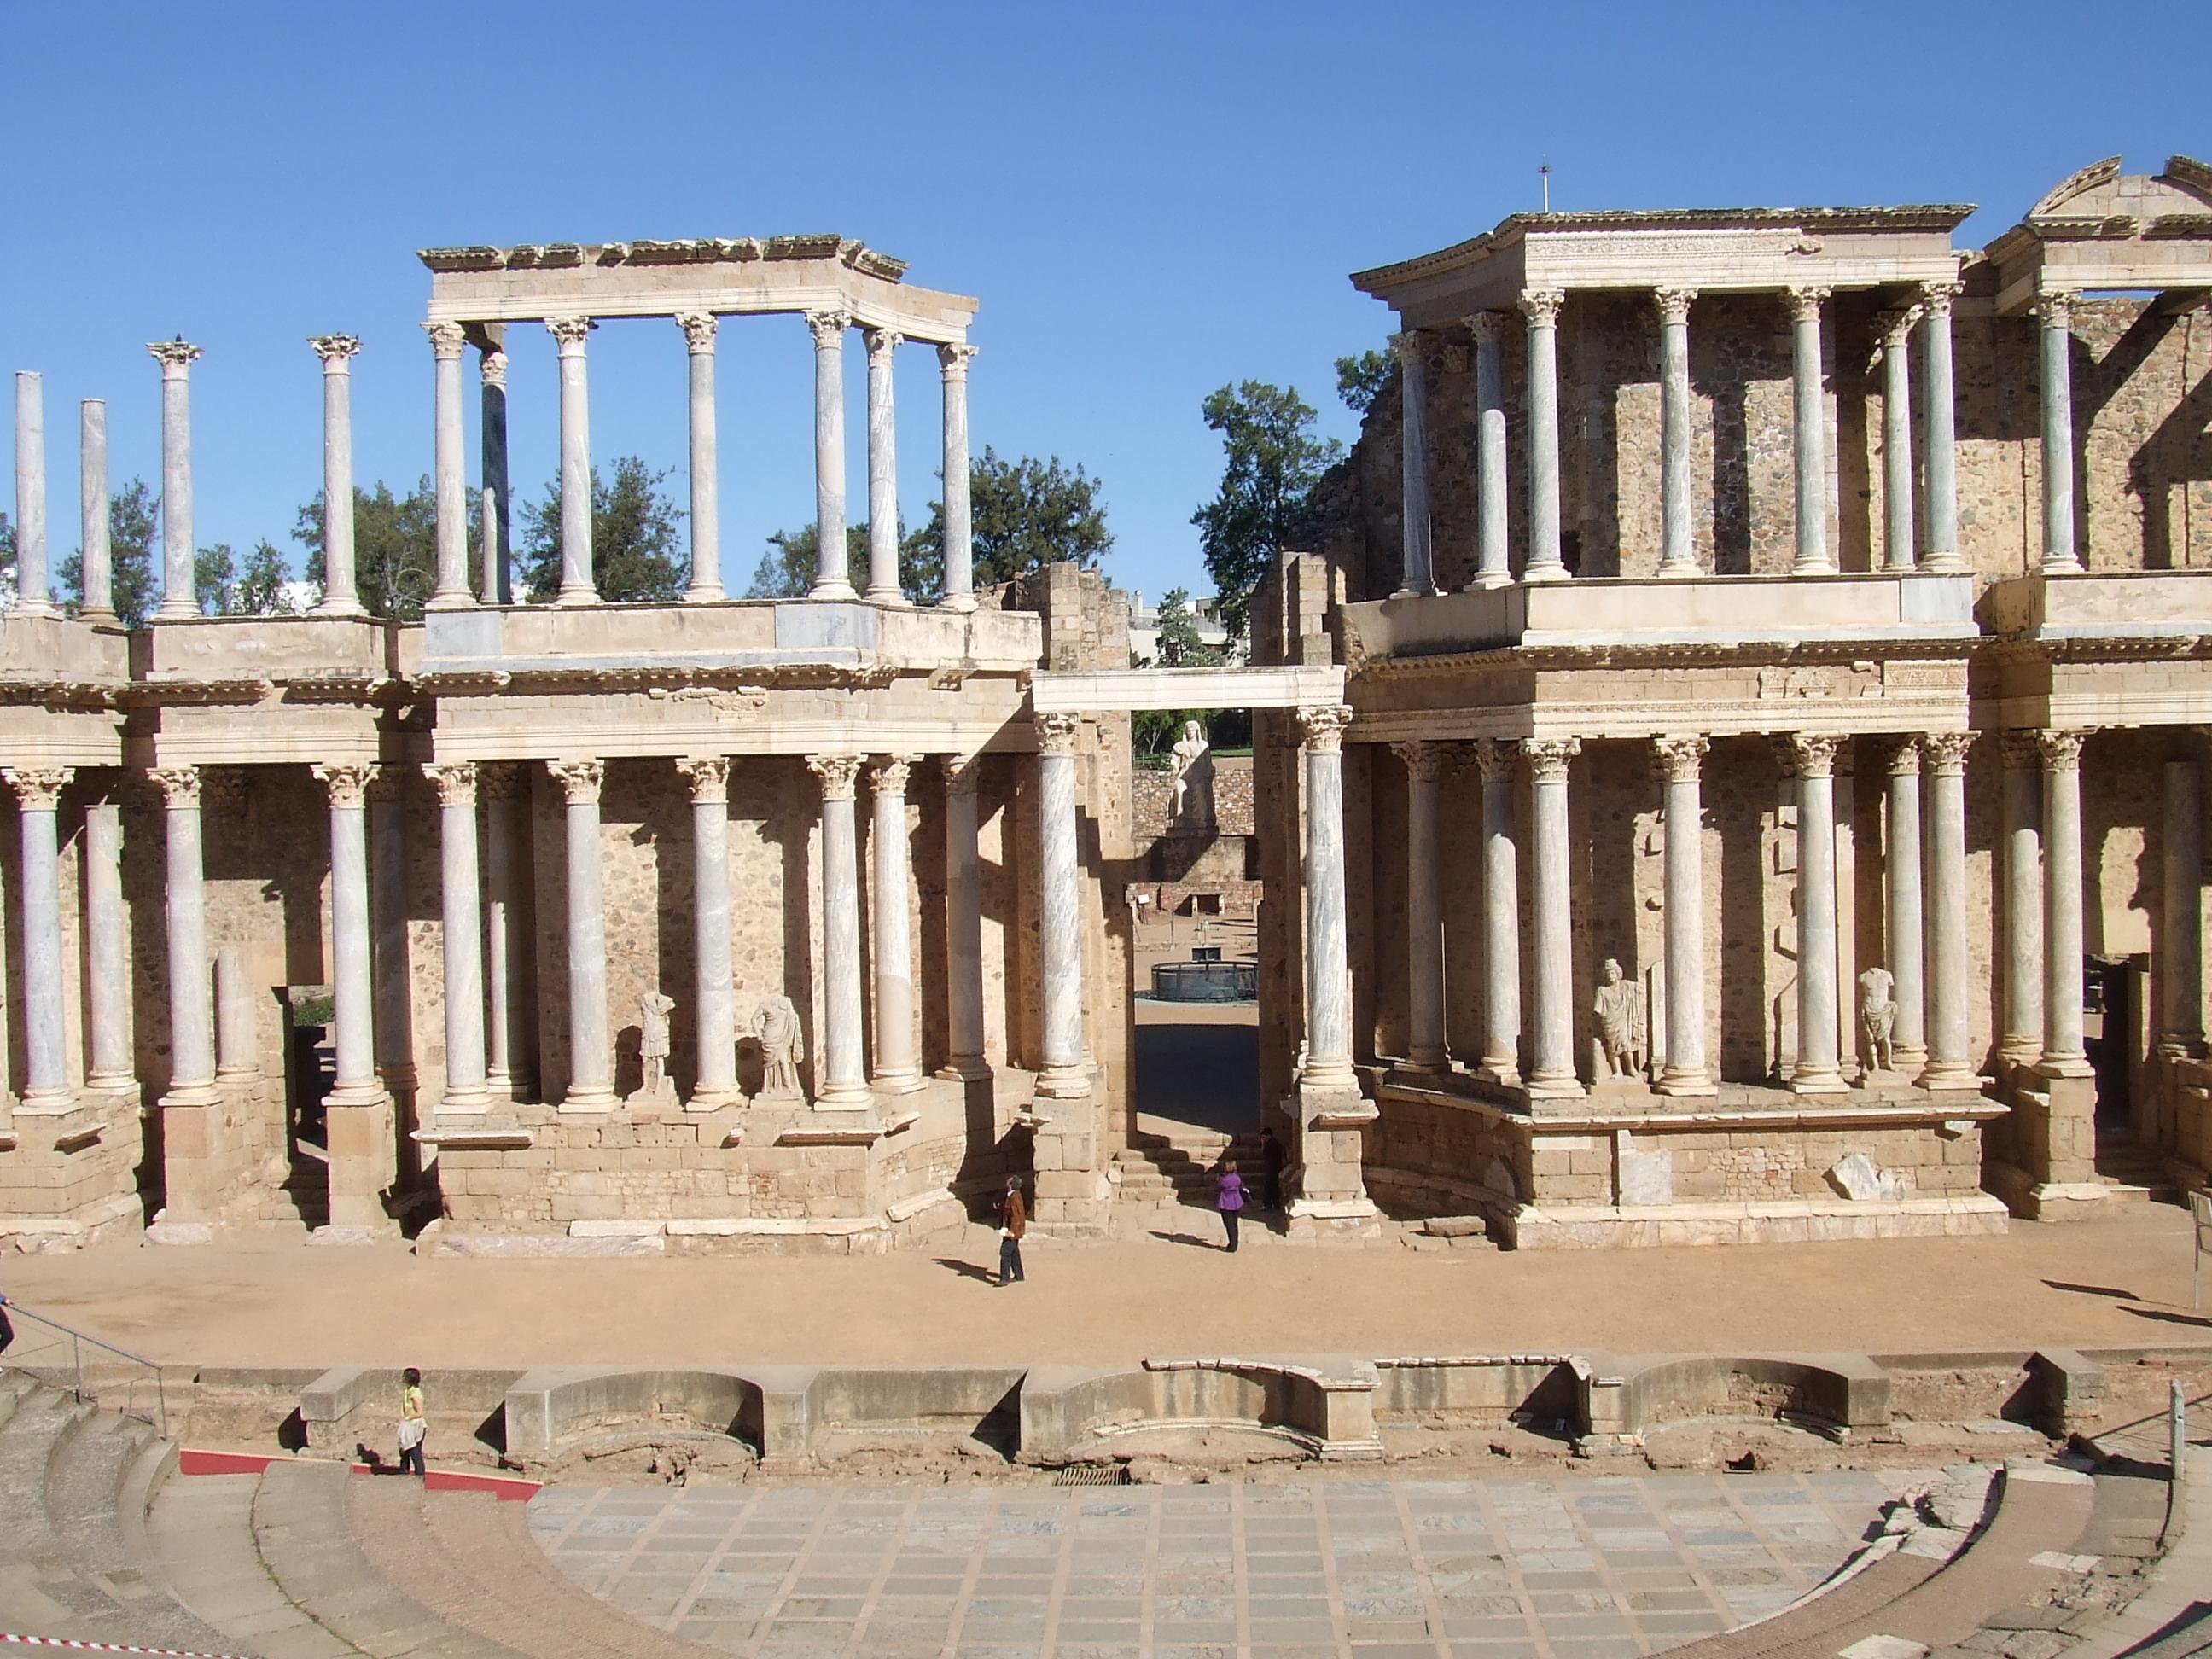 File:Teatro Romano de Mérida 01.JPG - Wikimedia Commons